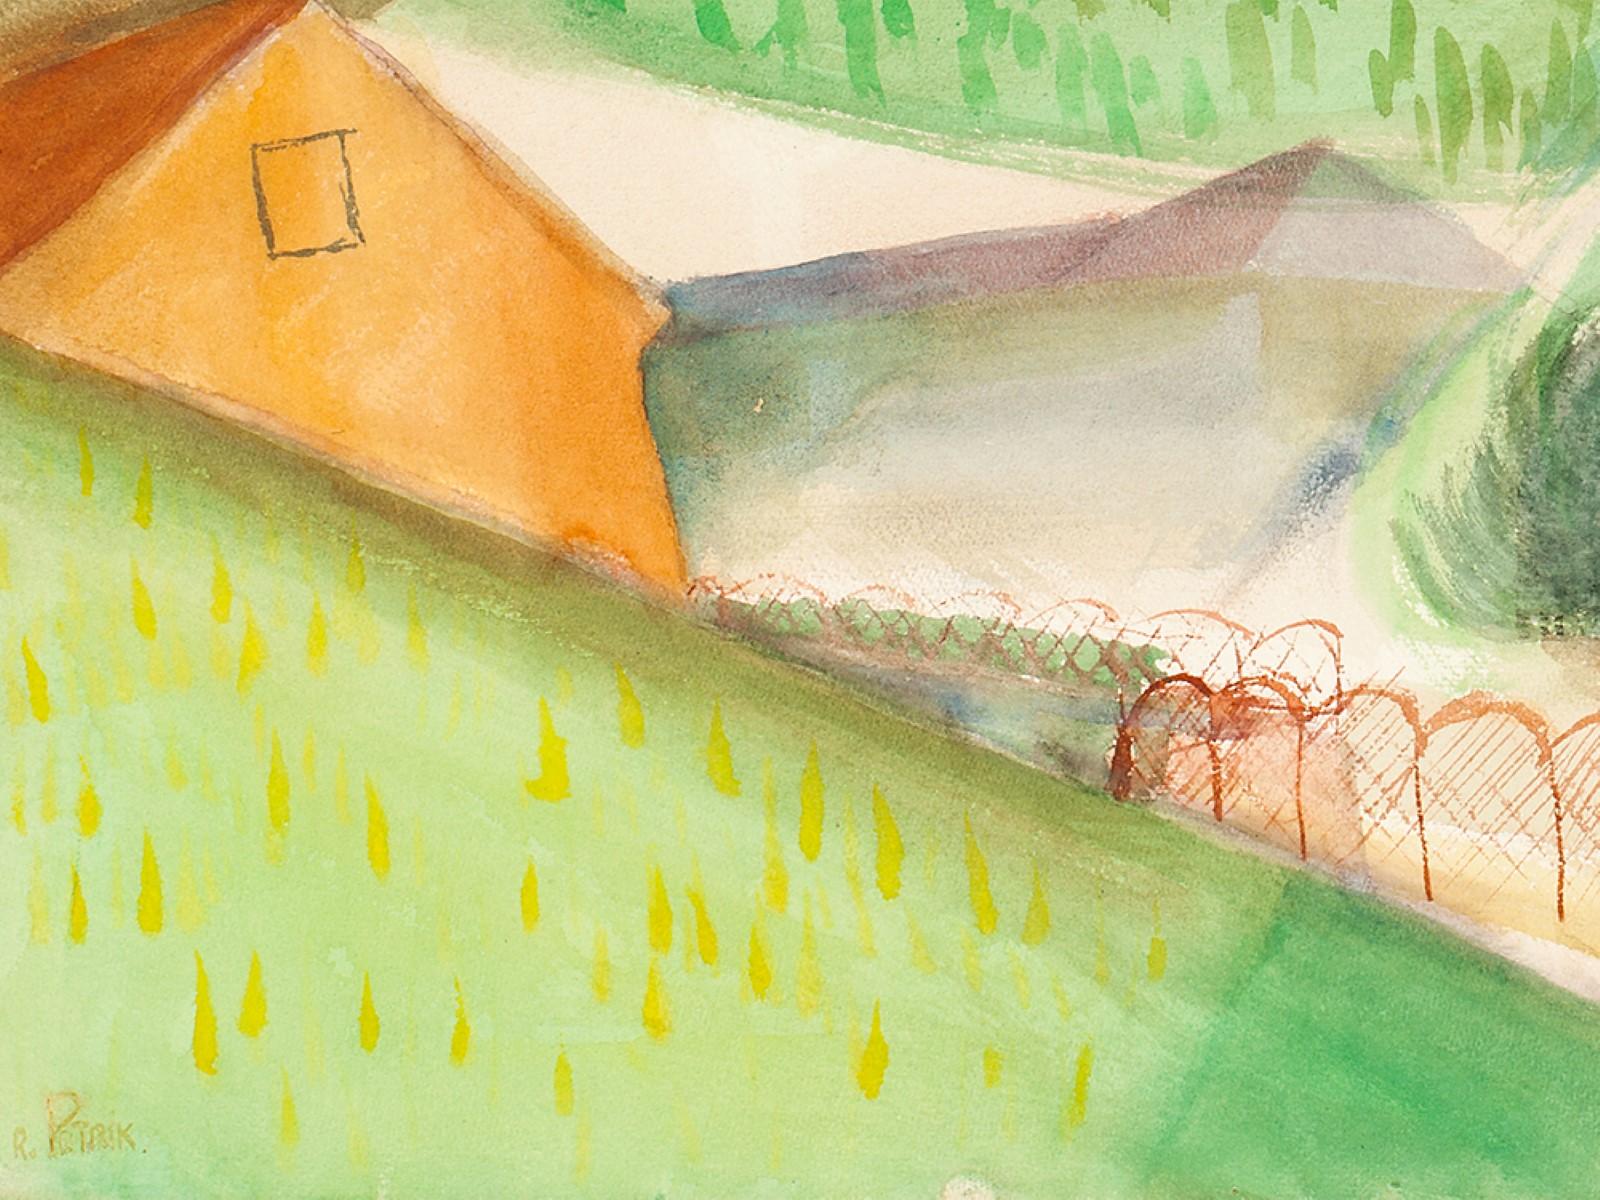 #124 Rudolf Petrik* (1922-1991), In the Valley, Austria,1950 | Rudolf Petrik* (1922-1991), Im Tal, Österreich, ca.1950 Image